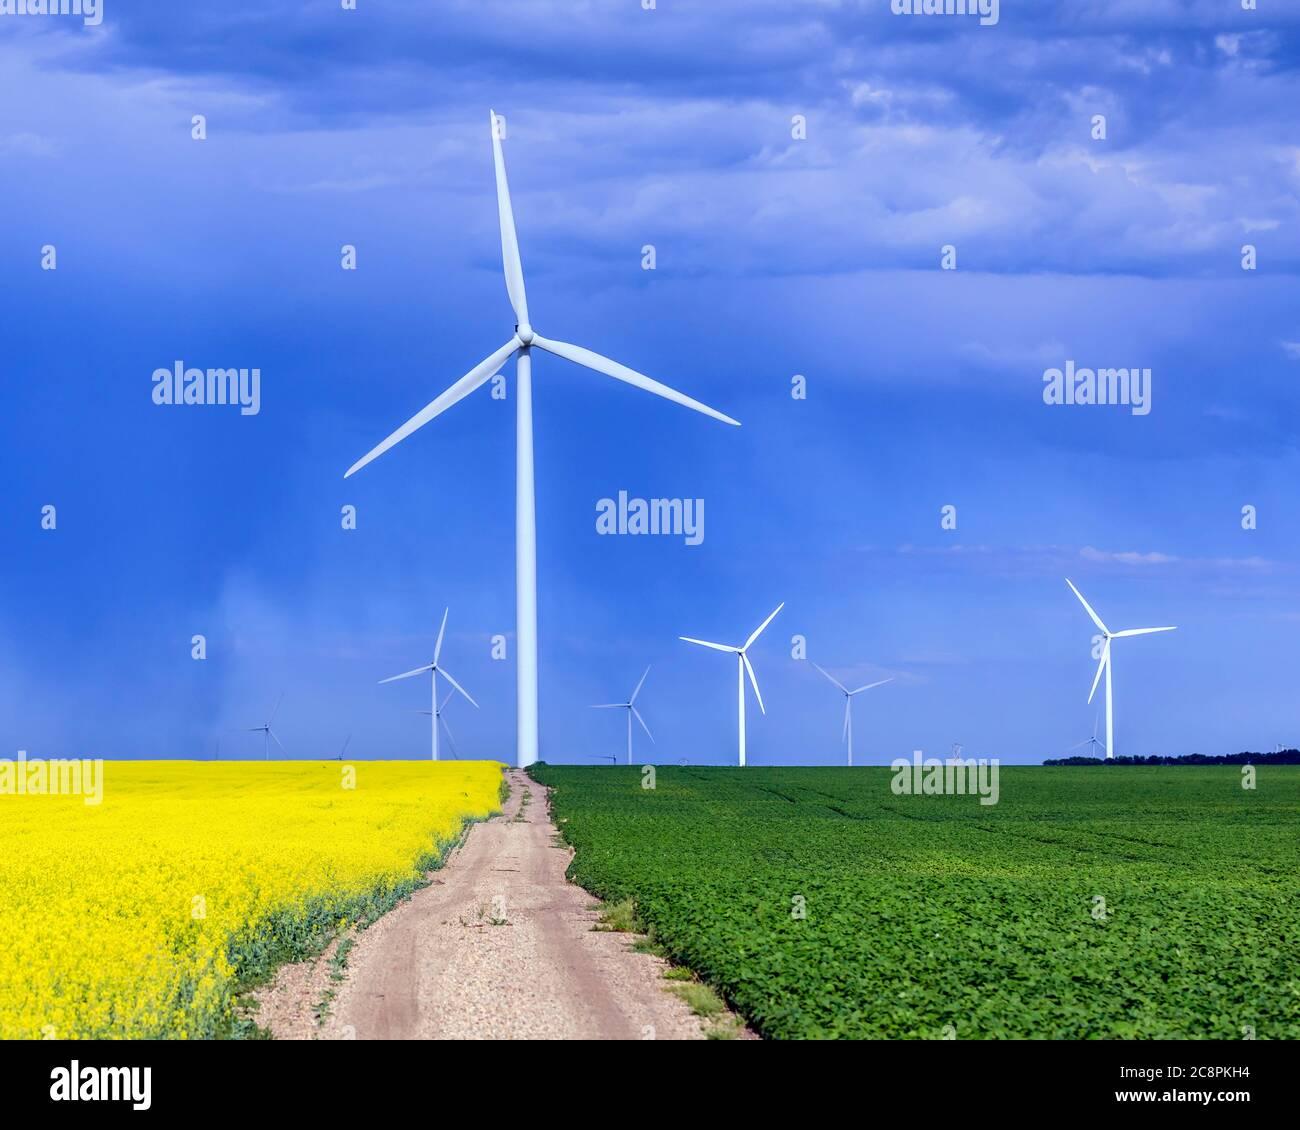 Wind energy turbines, St. Leon, Manitoba, Canada. Stock Photo